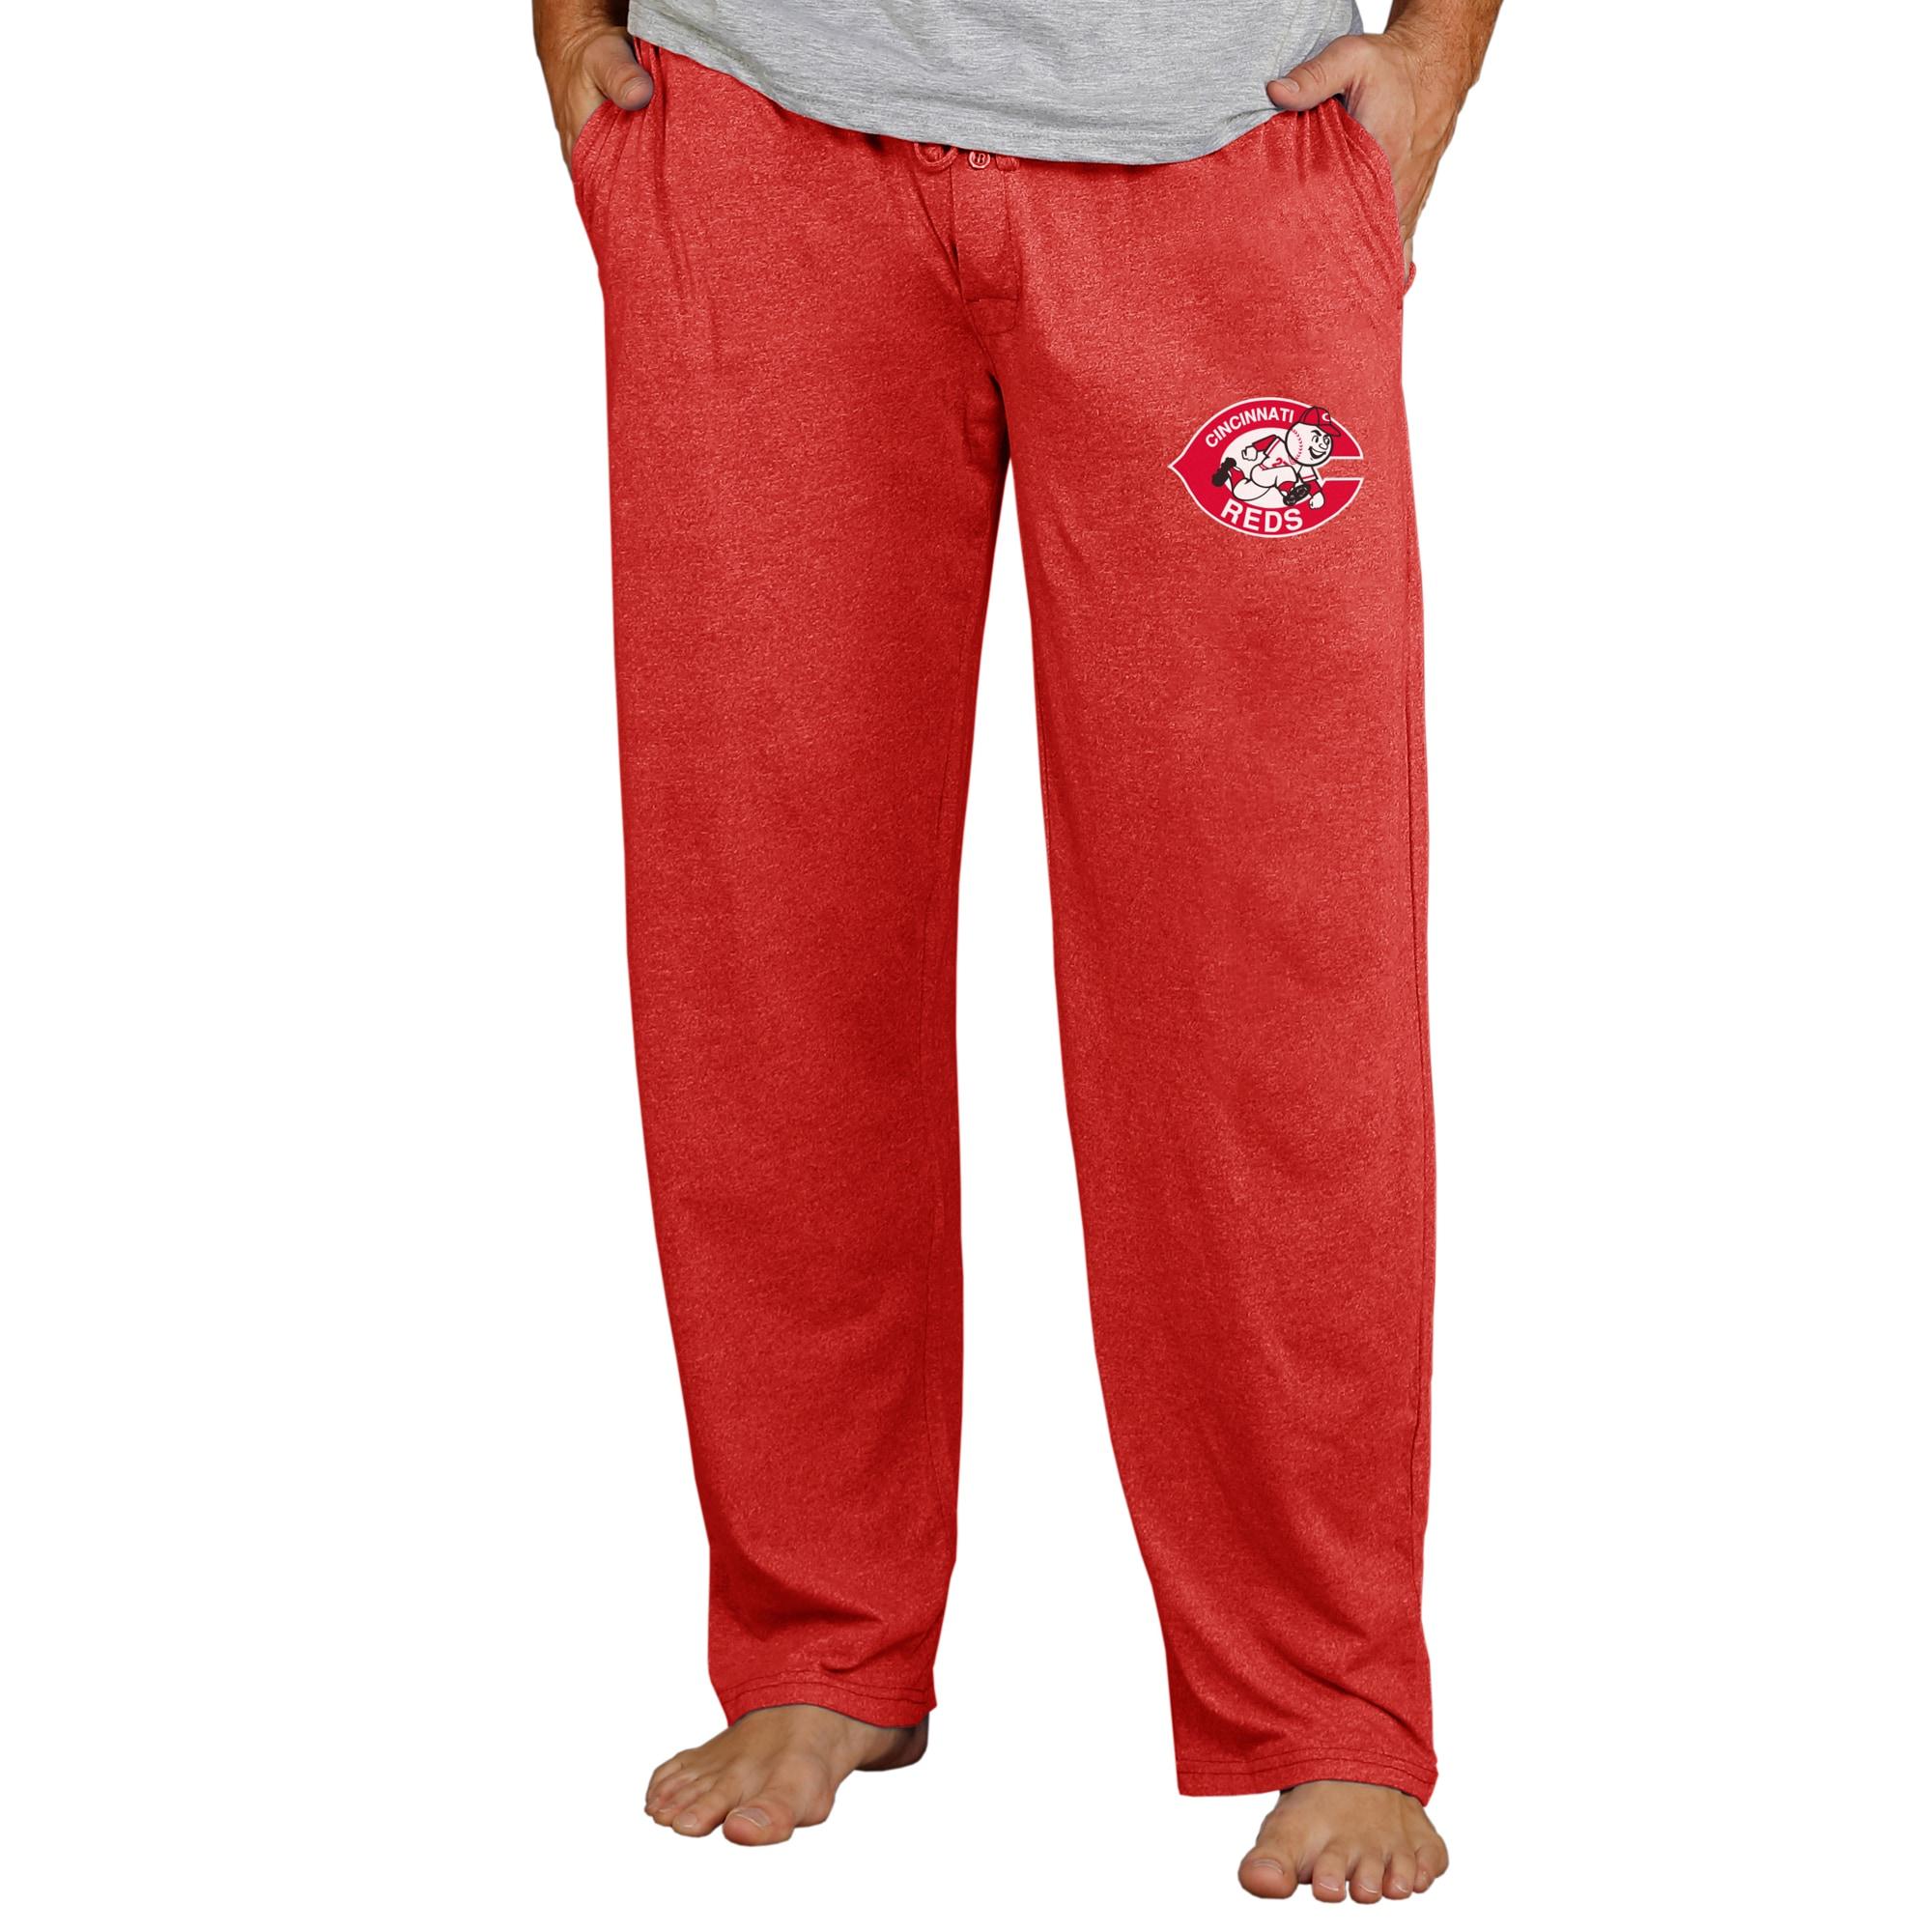 Cincinnati Reds Concepts Sport Cooperstown Quest Lounge Pants - Red